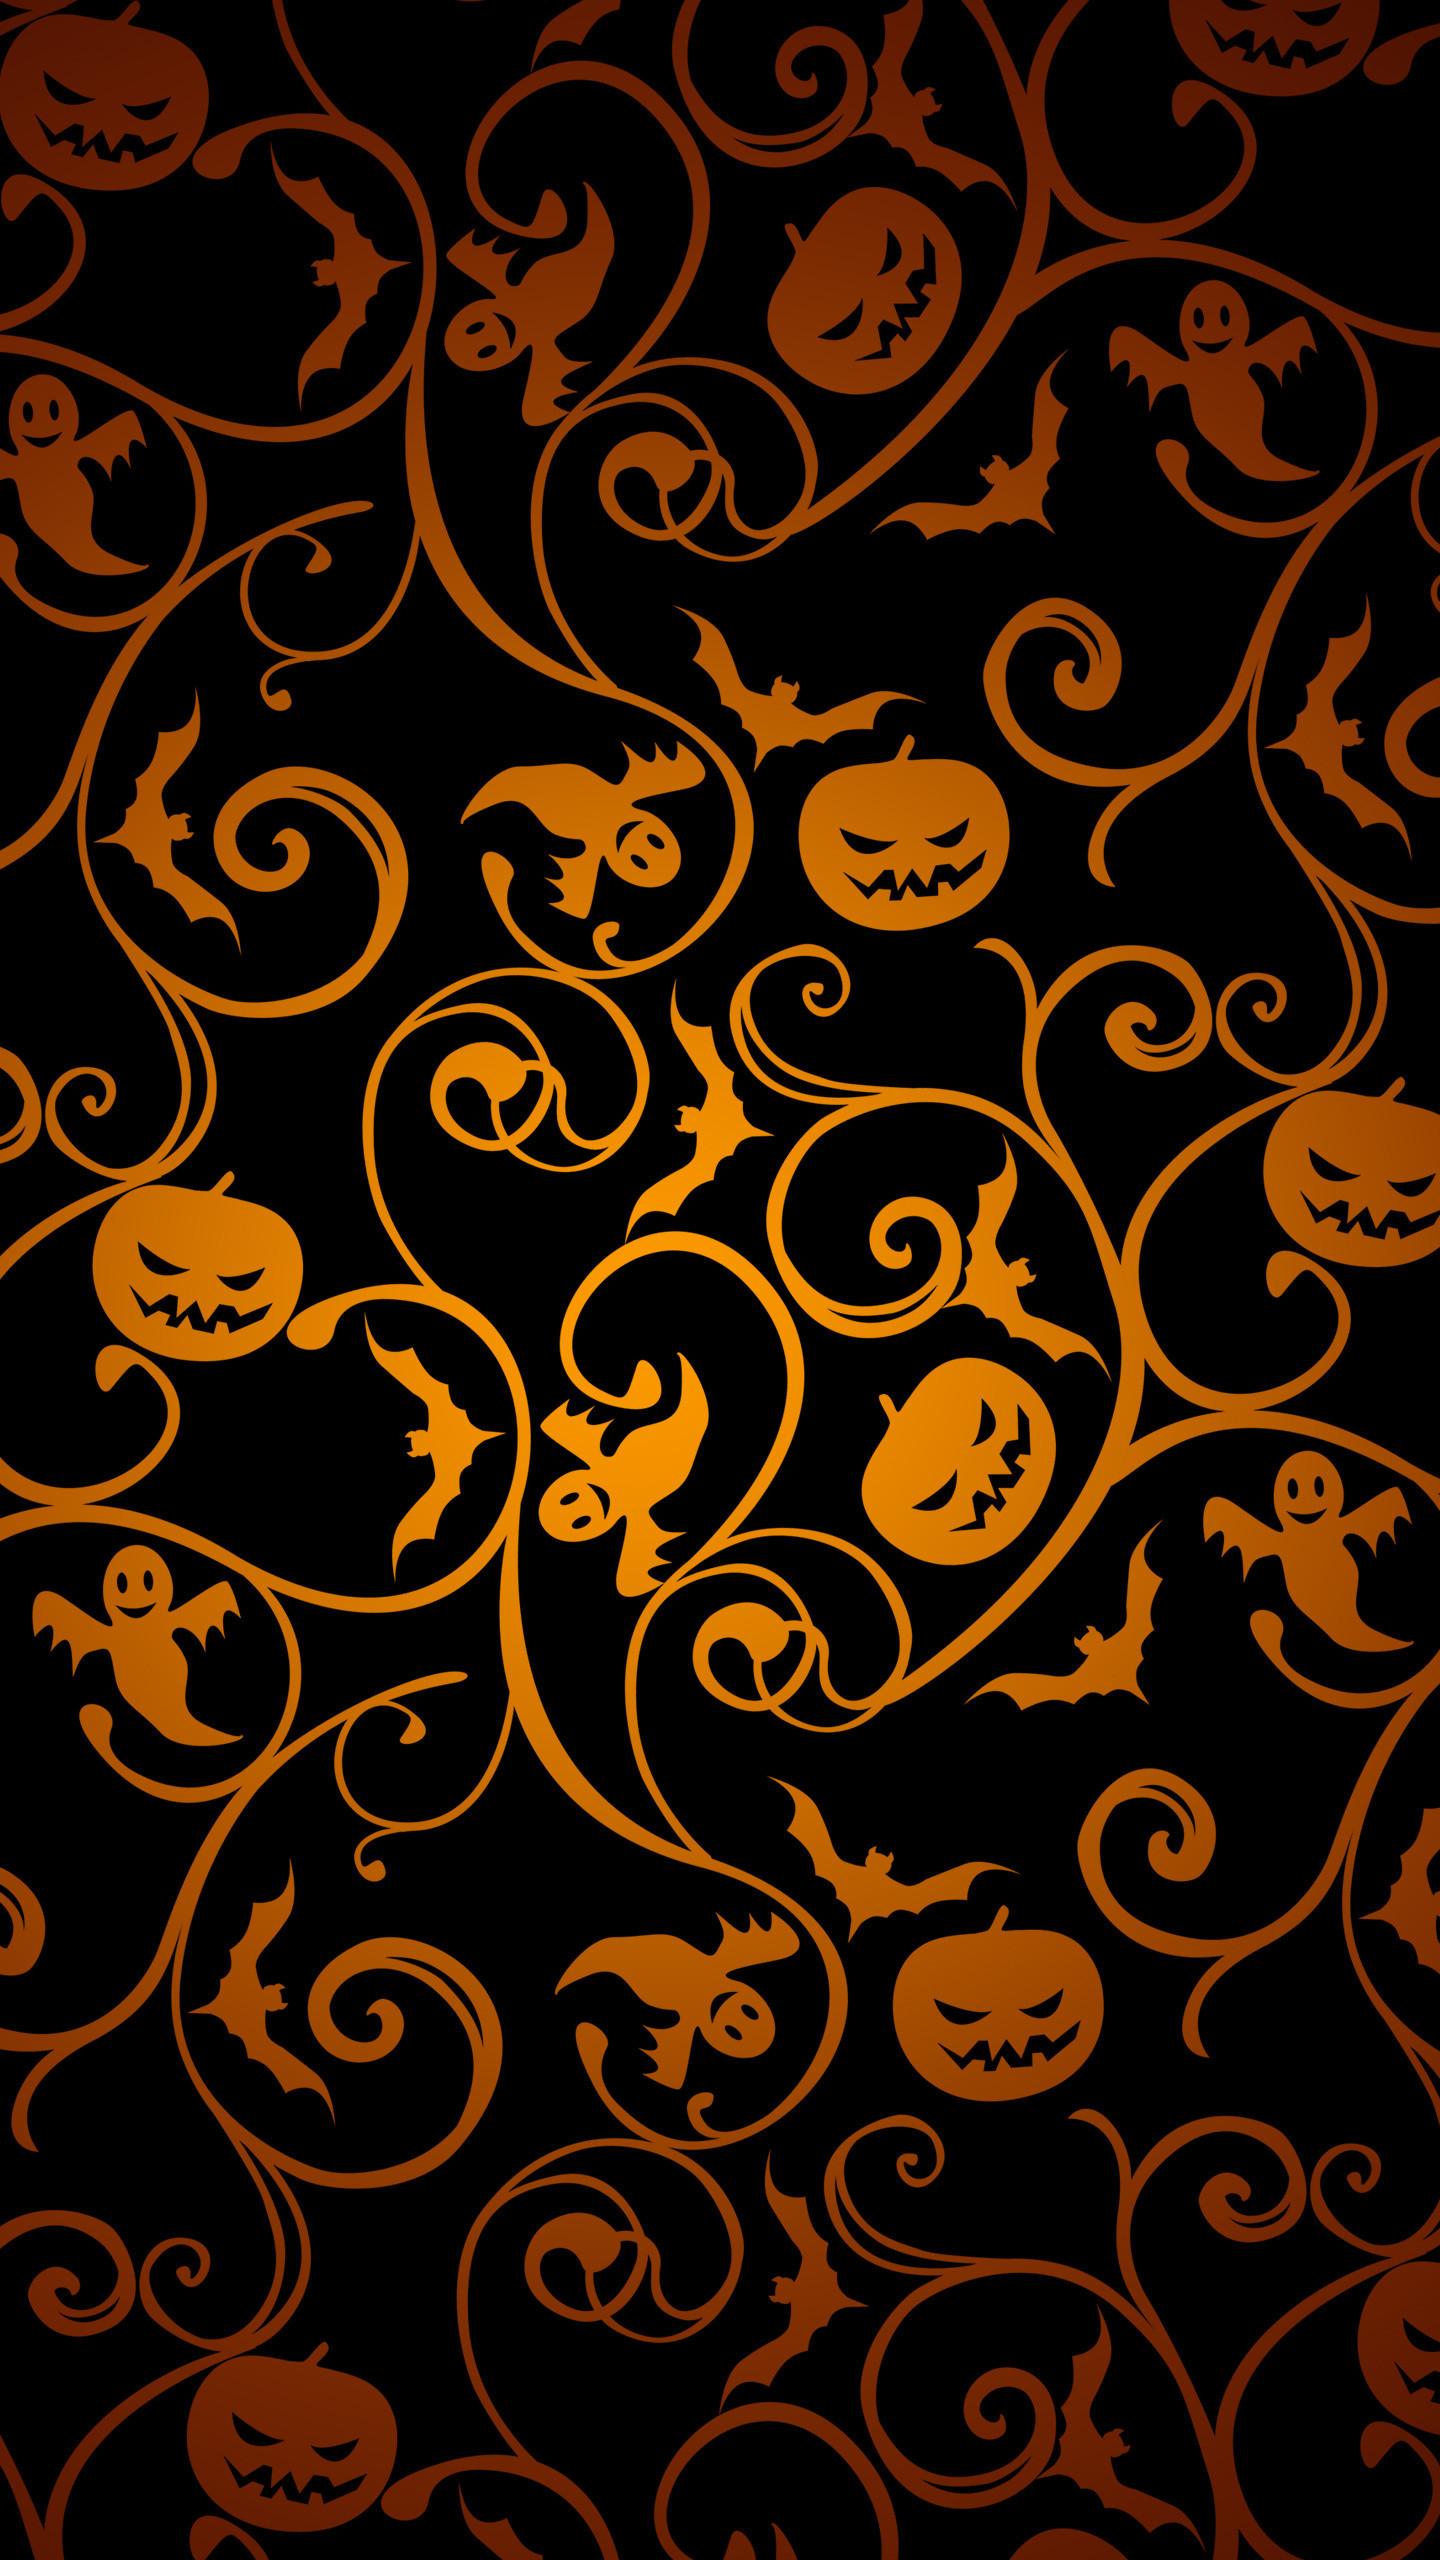 Mobile Halloween Wallpaper